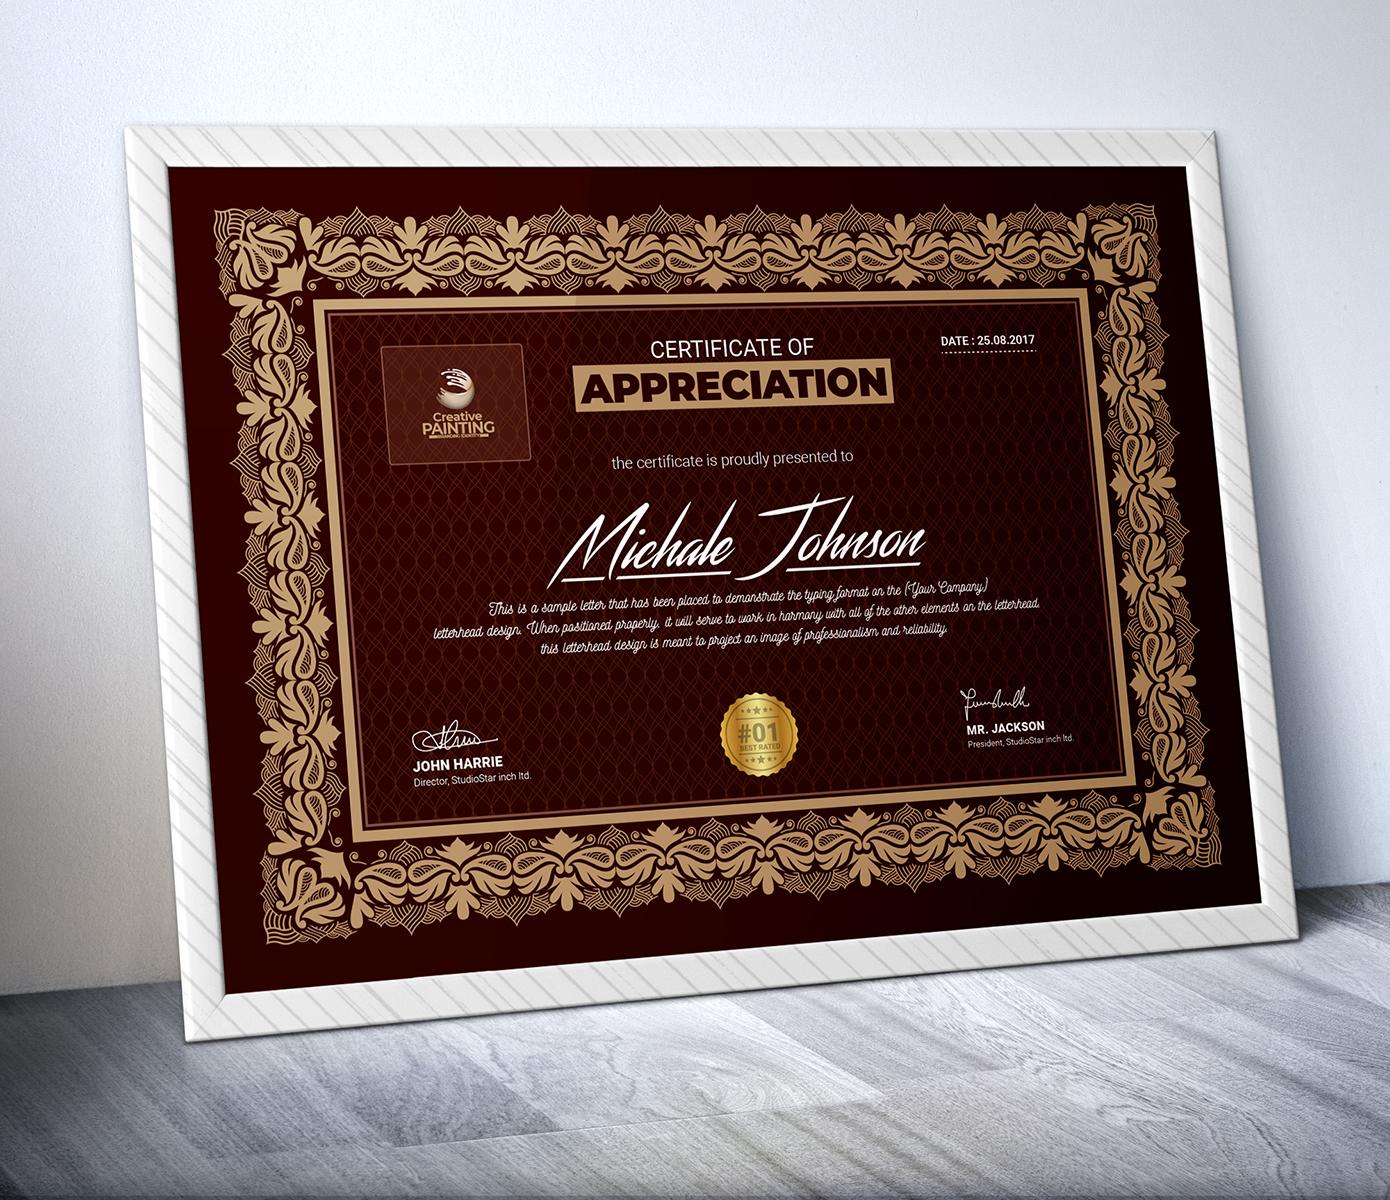 Michale Johnson Multipurpose Design Certificate Template 73708